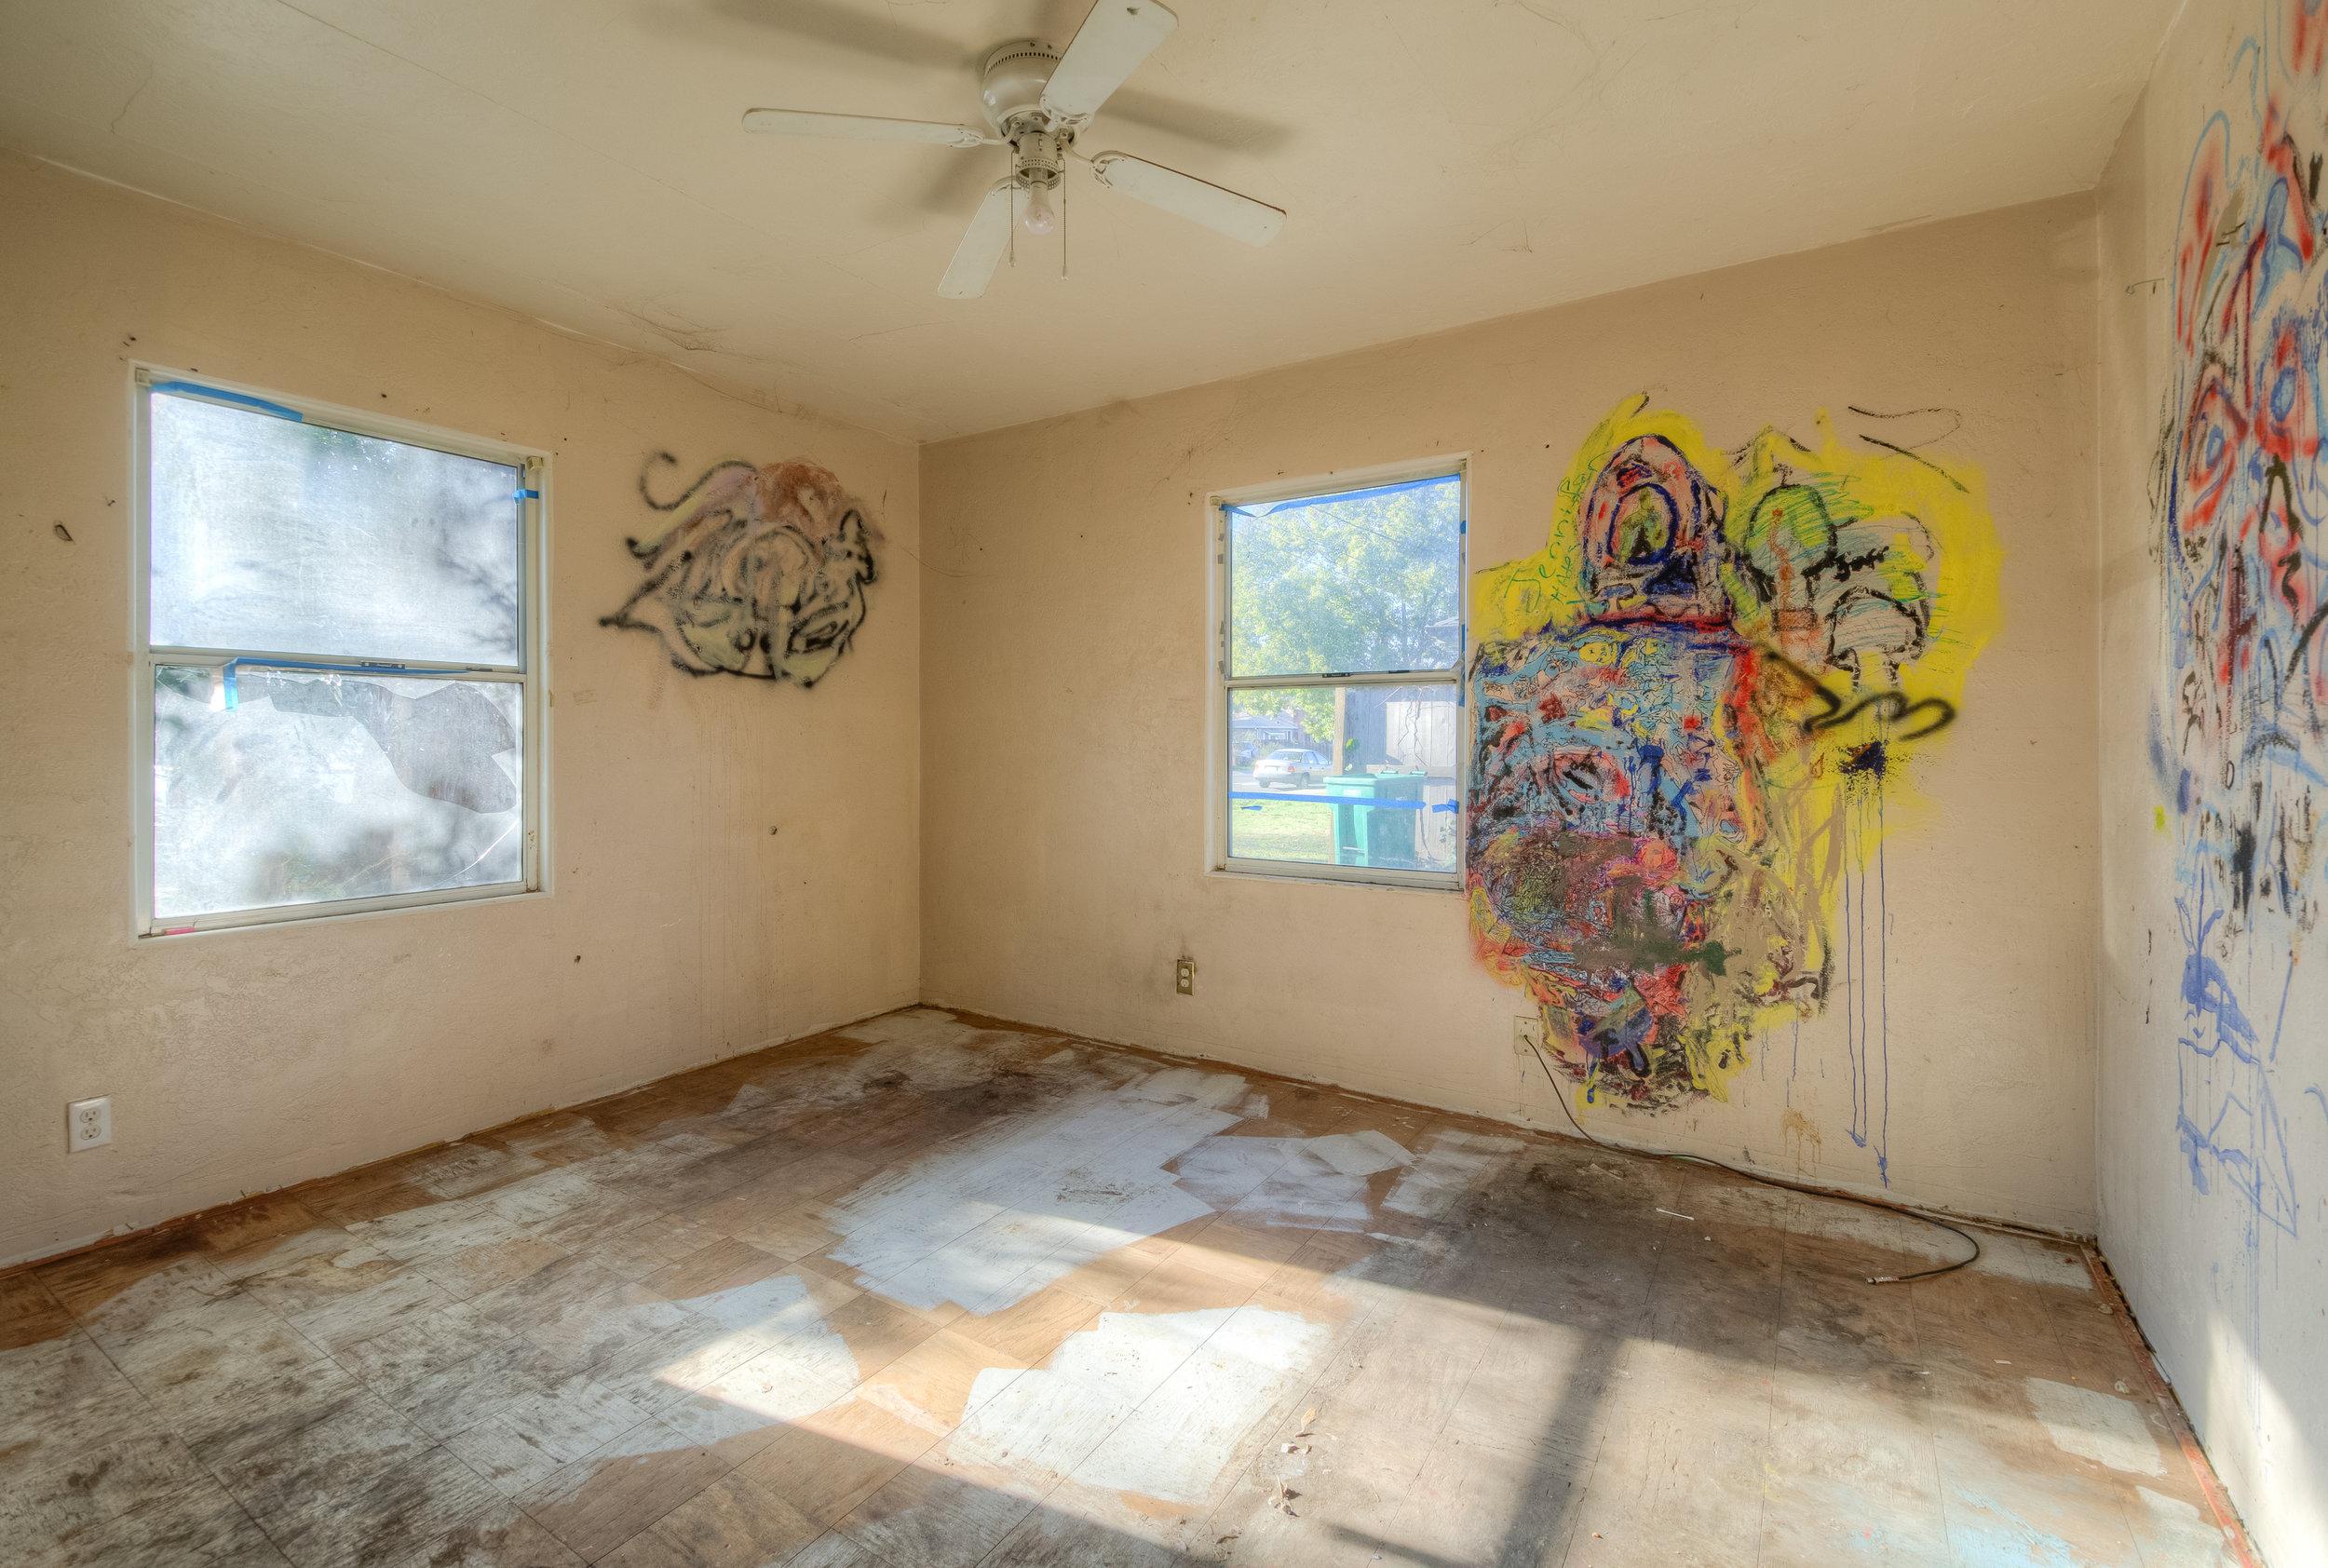 920 Neal Dow Ave 007 Bedroom 1.jpg